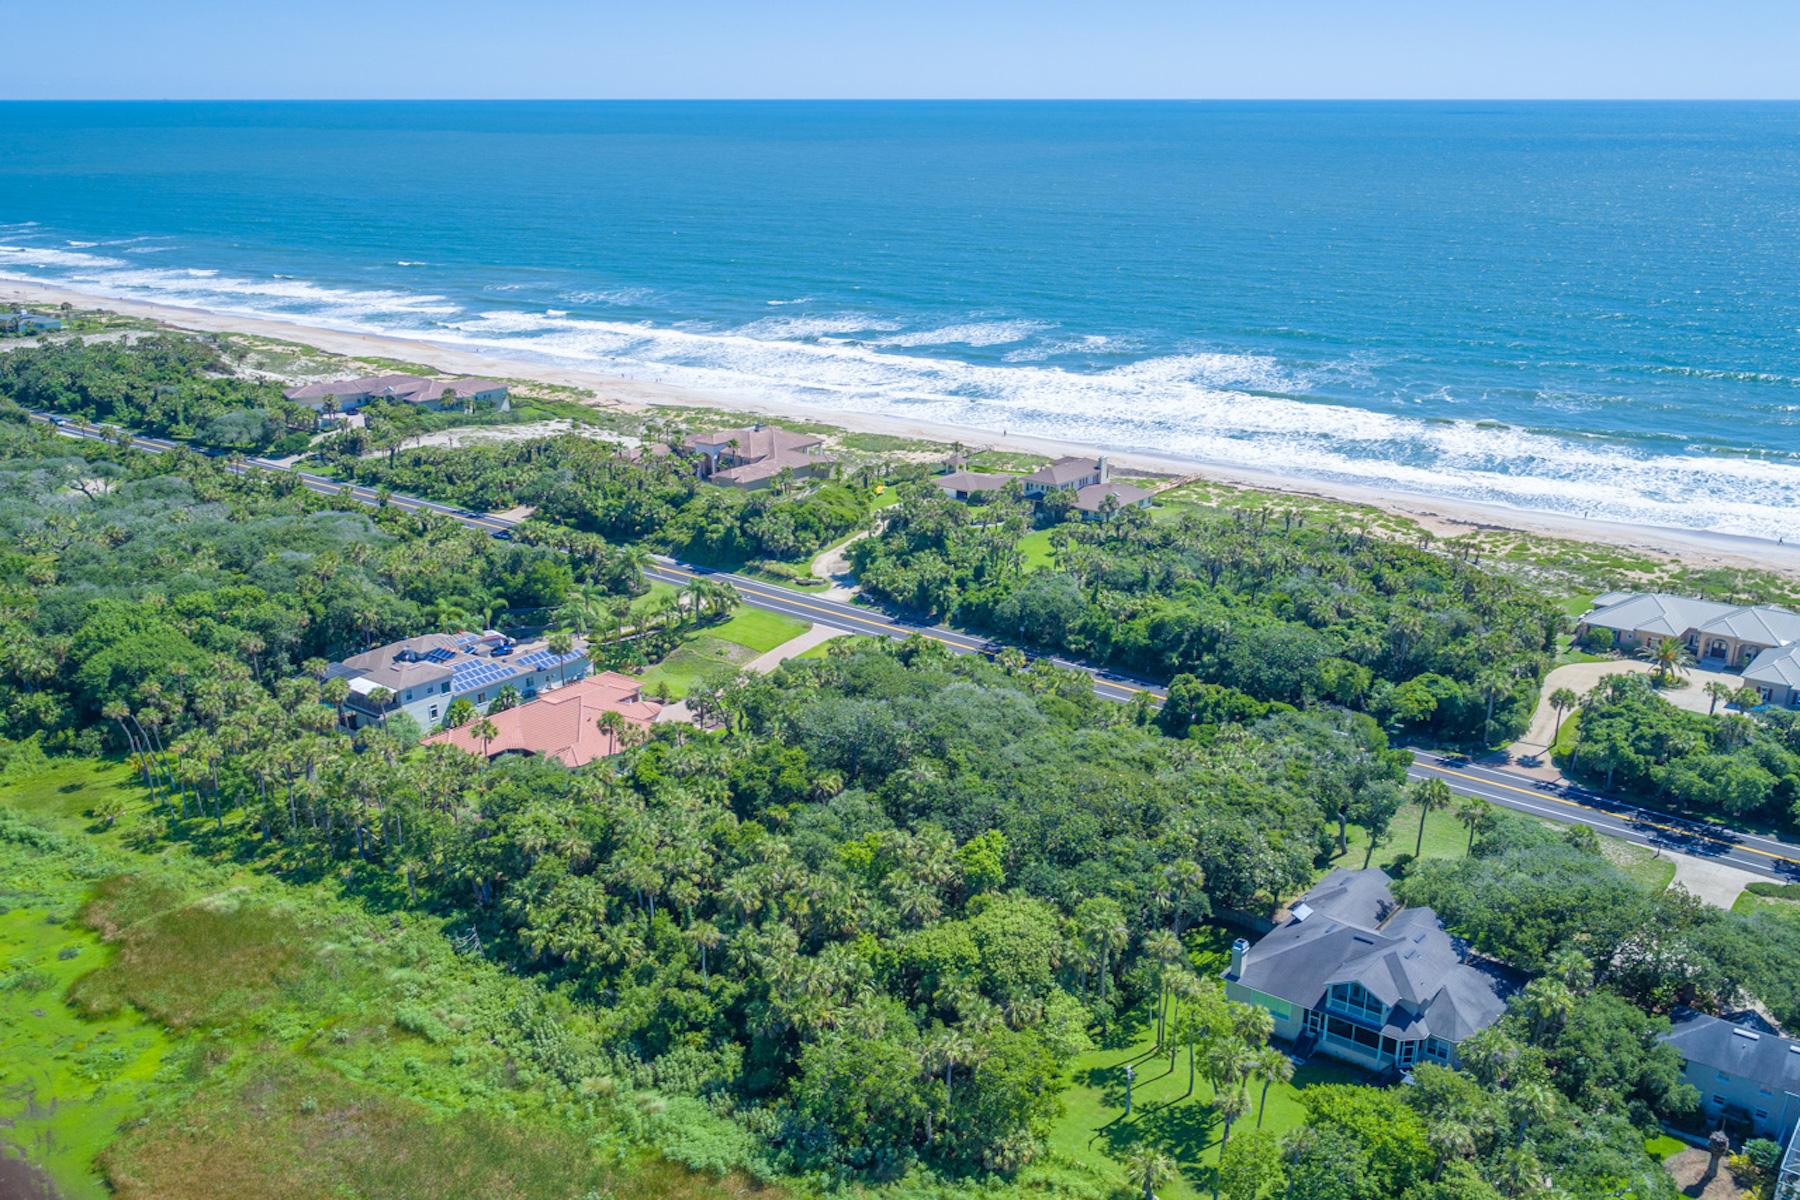 Land for Sale at 1162 Ponte Vedra Boulevard 1162 Ponte Vedra Boulevard Ponte Vedra Beach, Florida 32082 United States